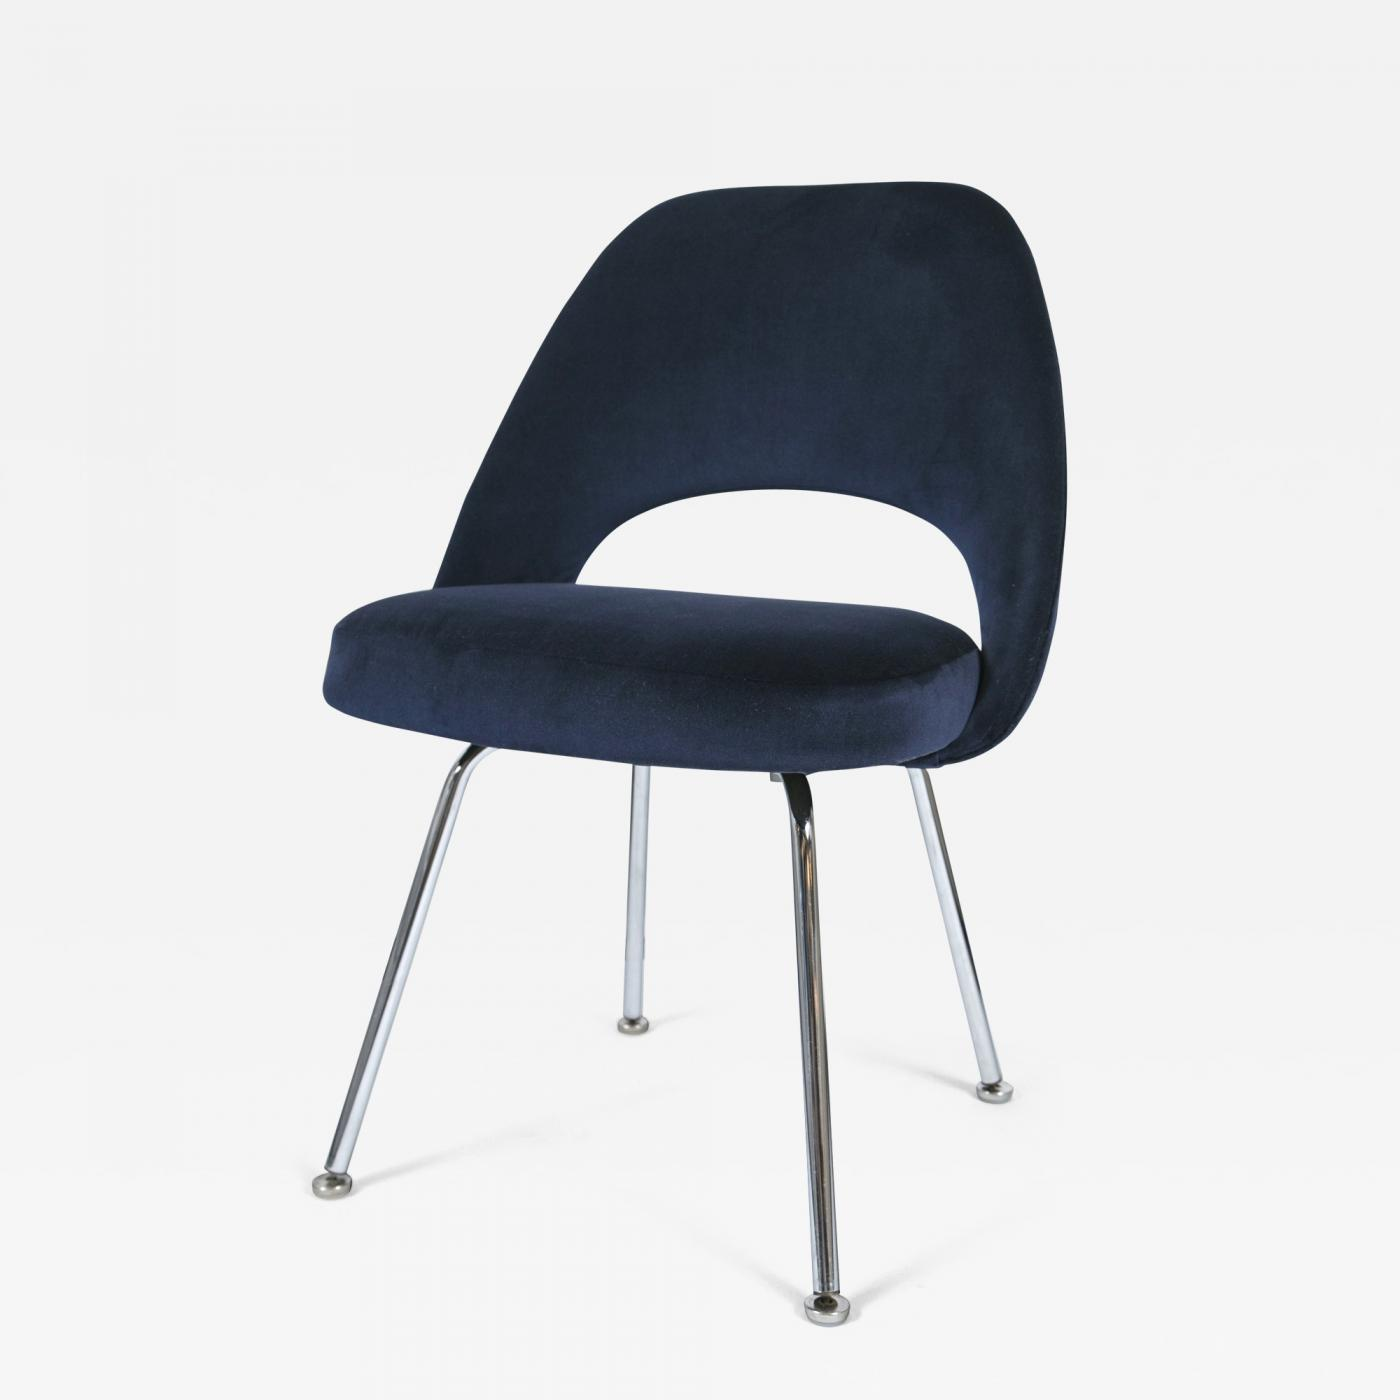 Eero Saarinen Saarinen Executive Armless Chair In Navy